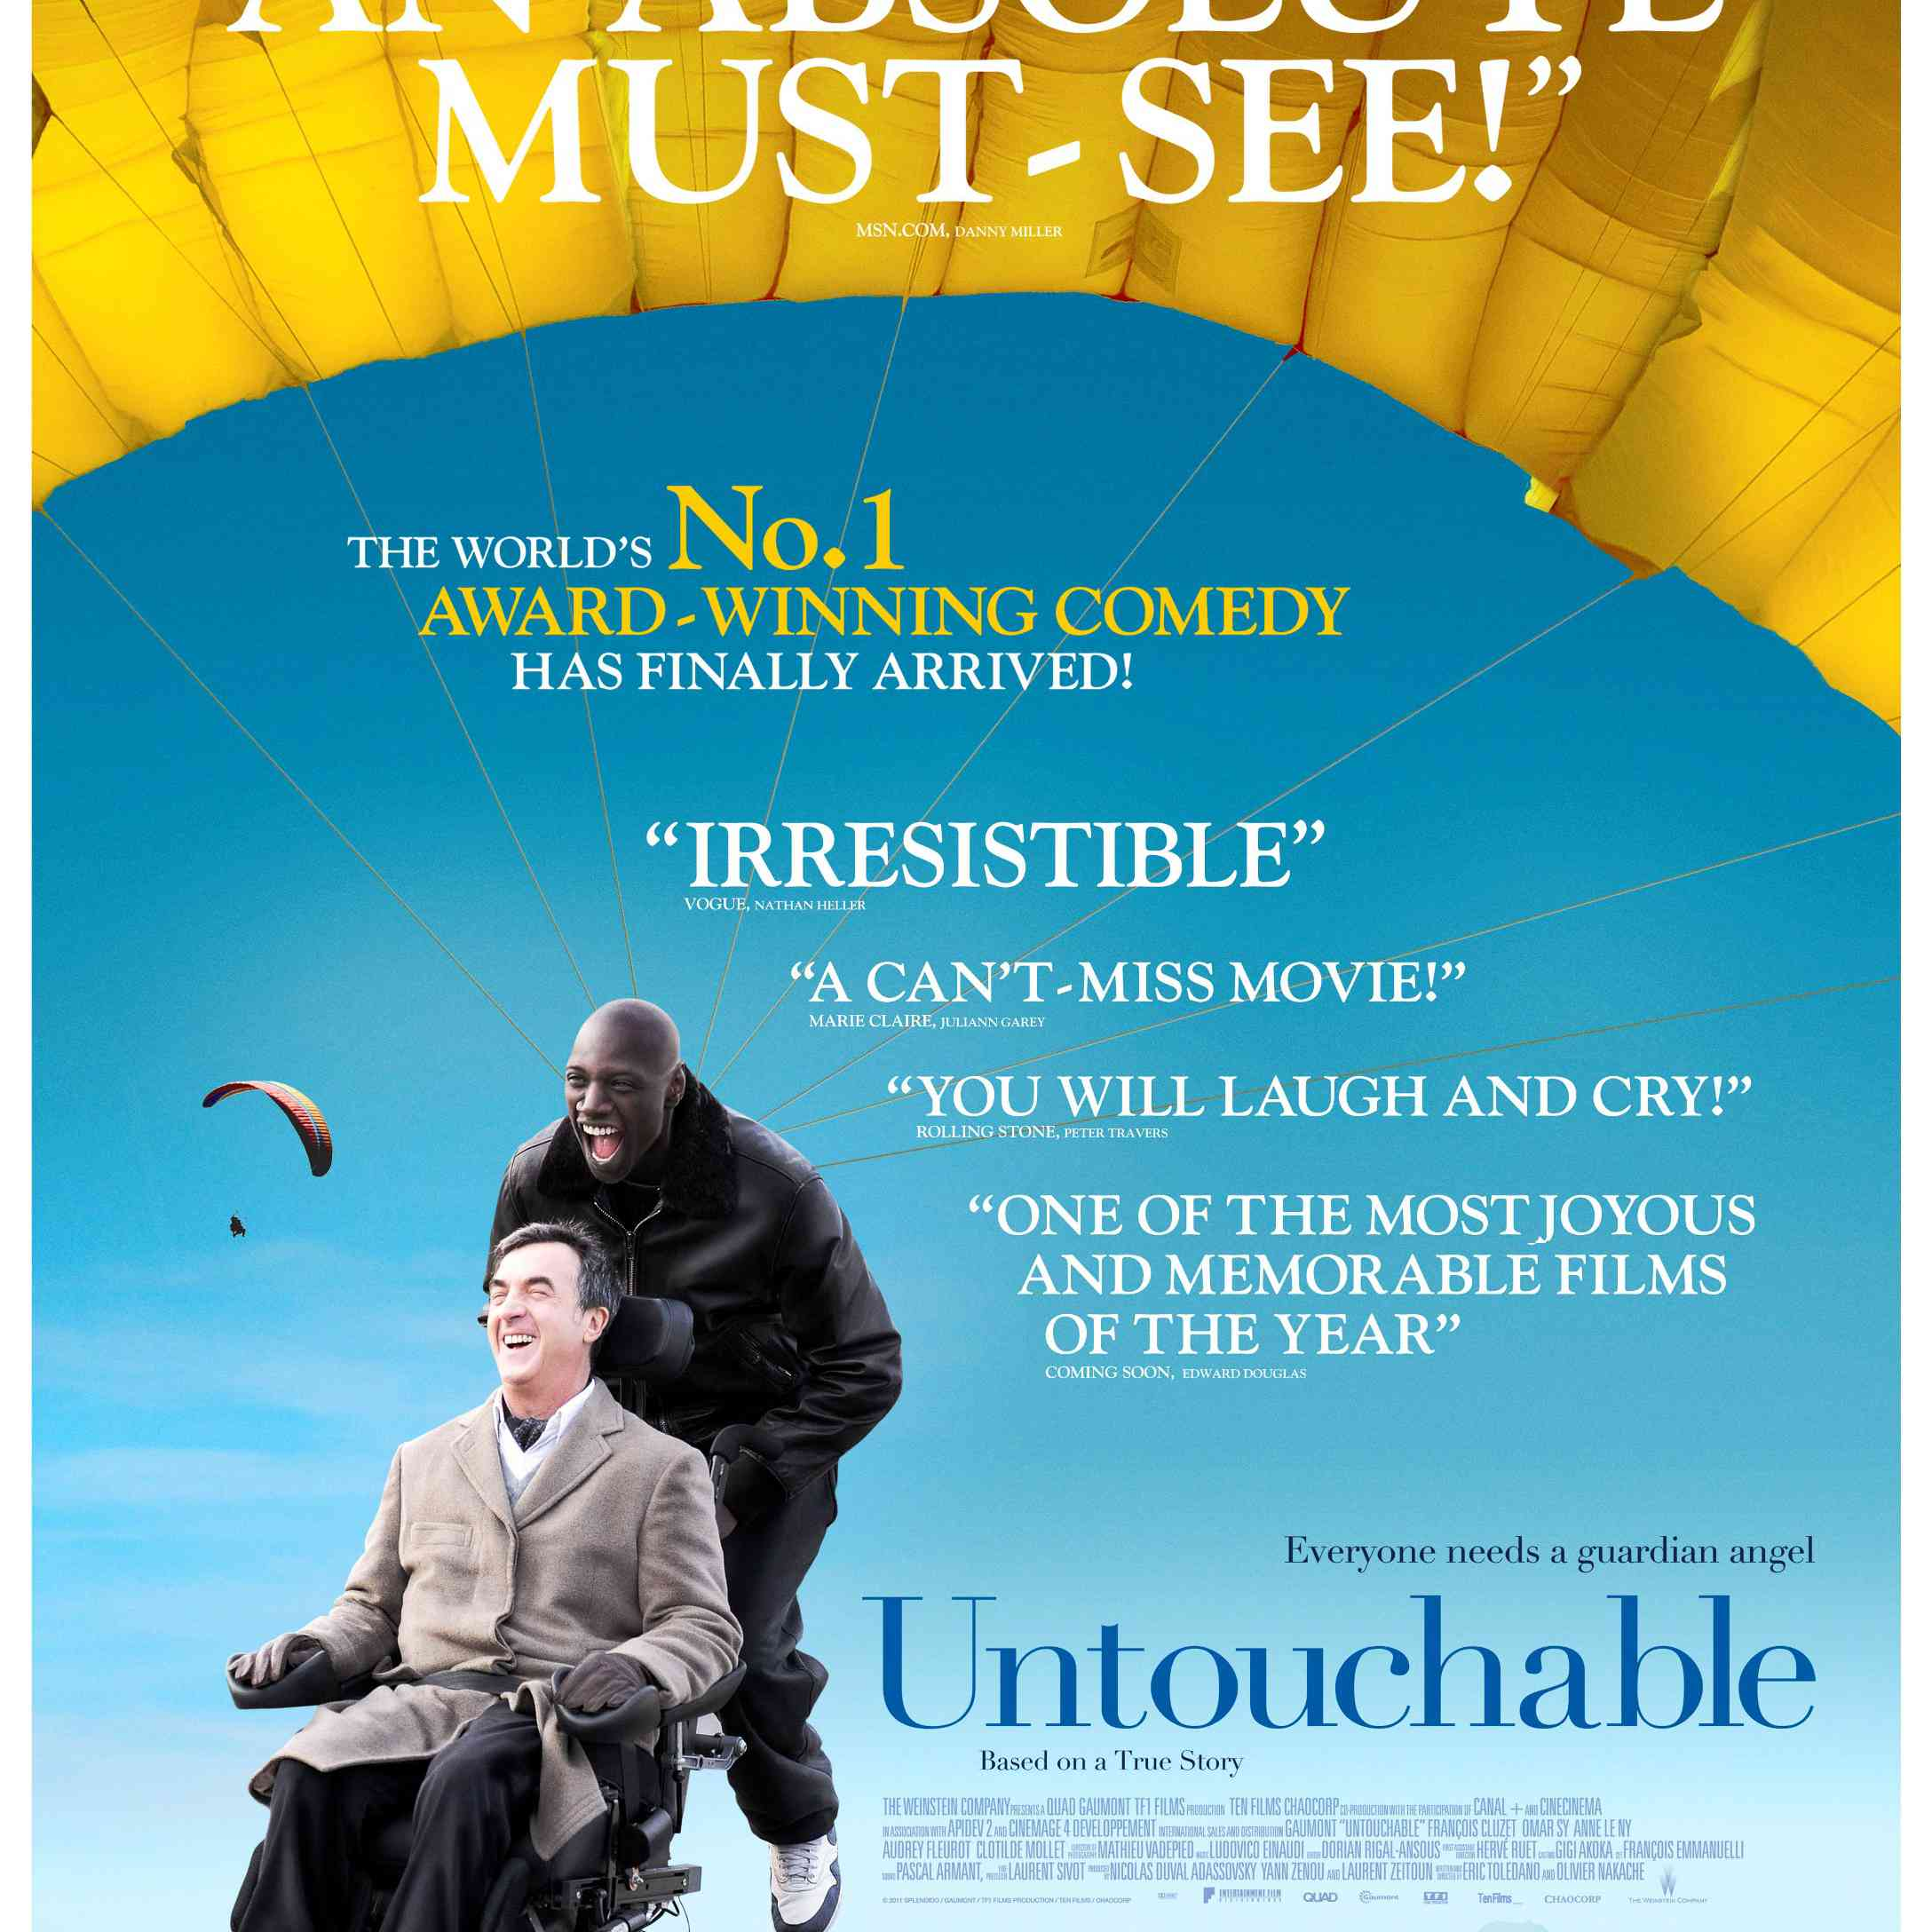 Untouchable poster.